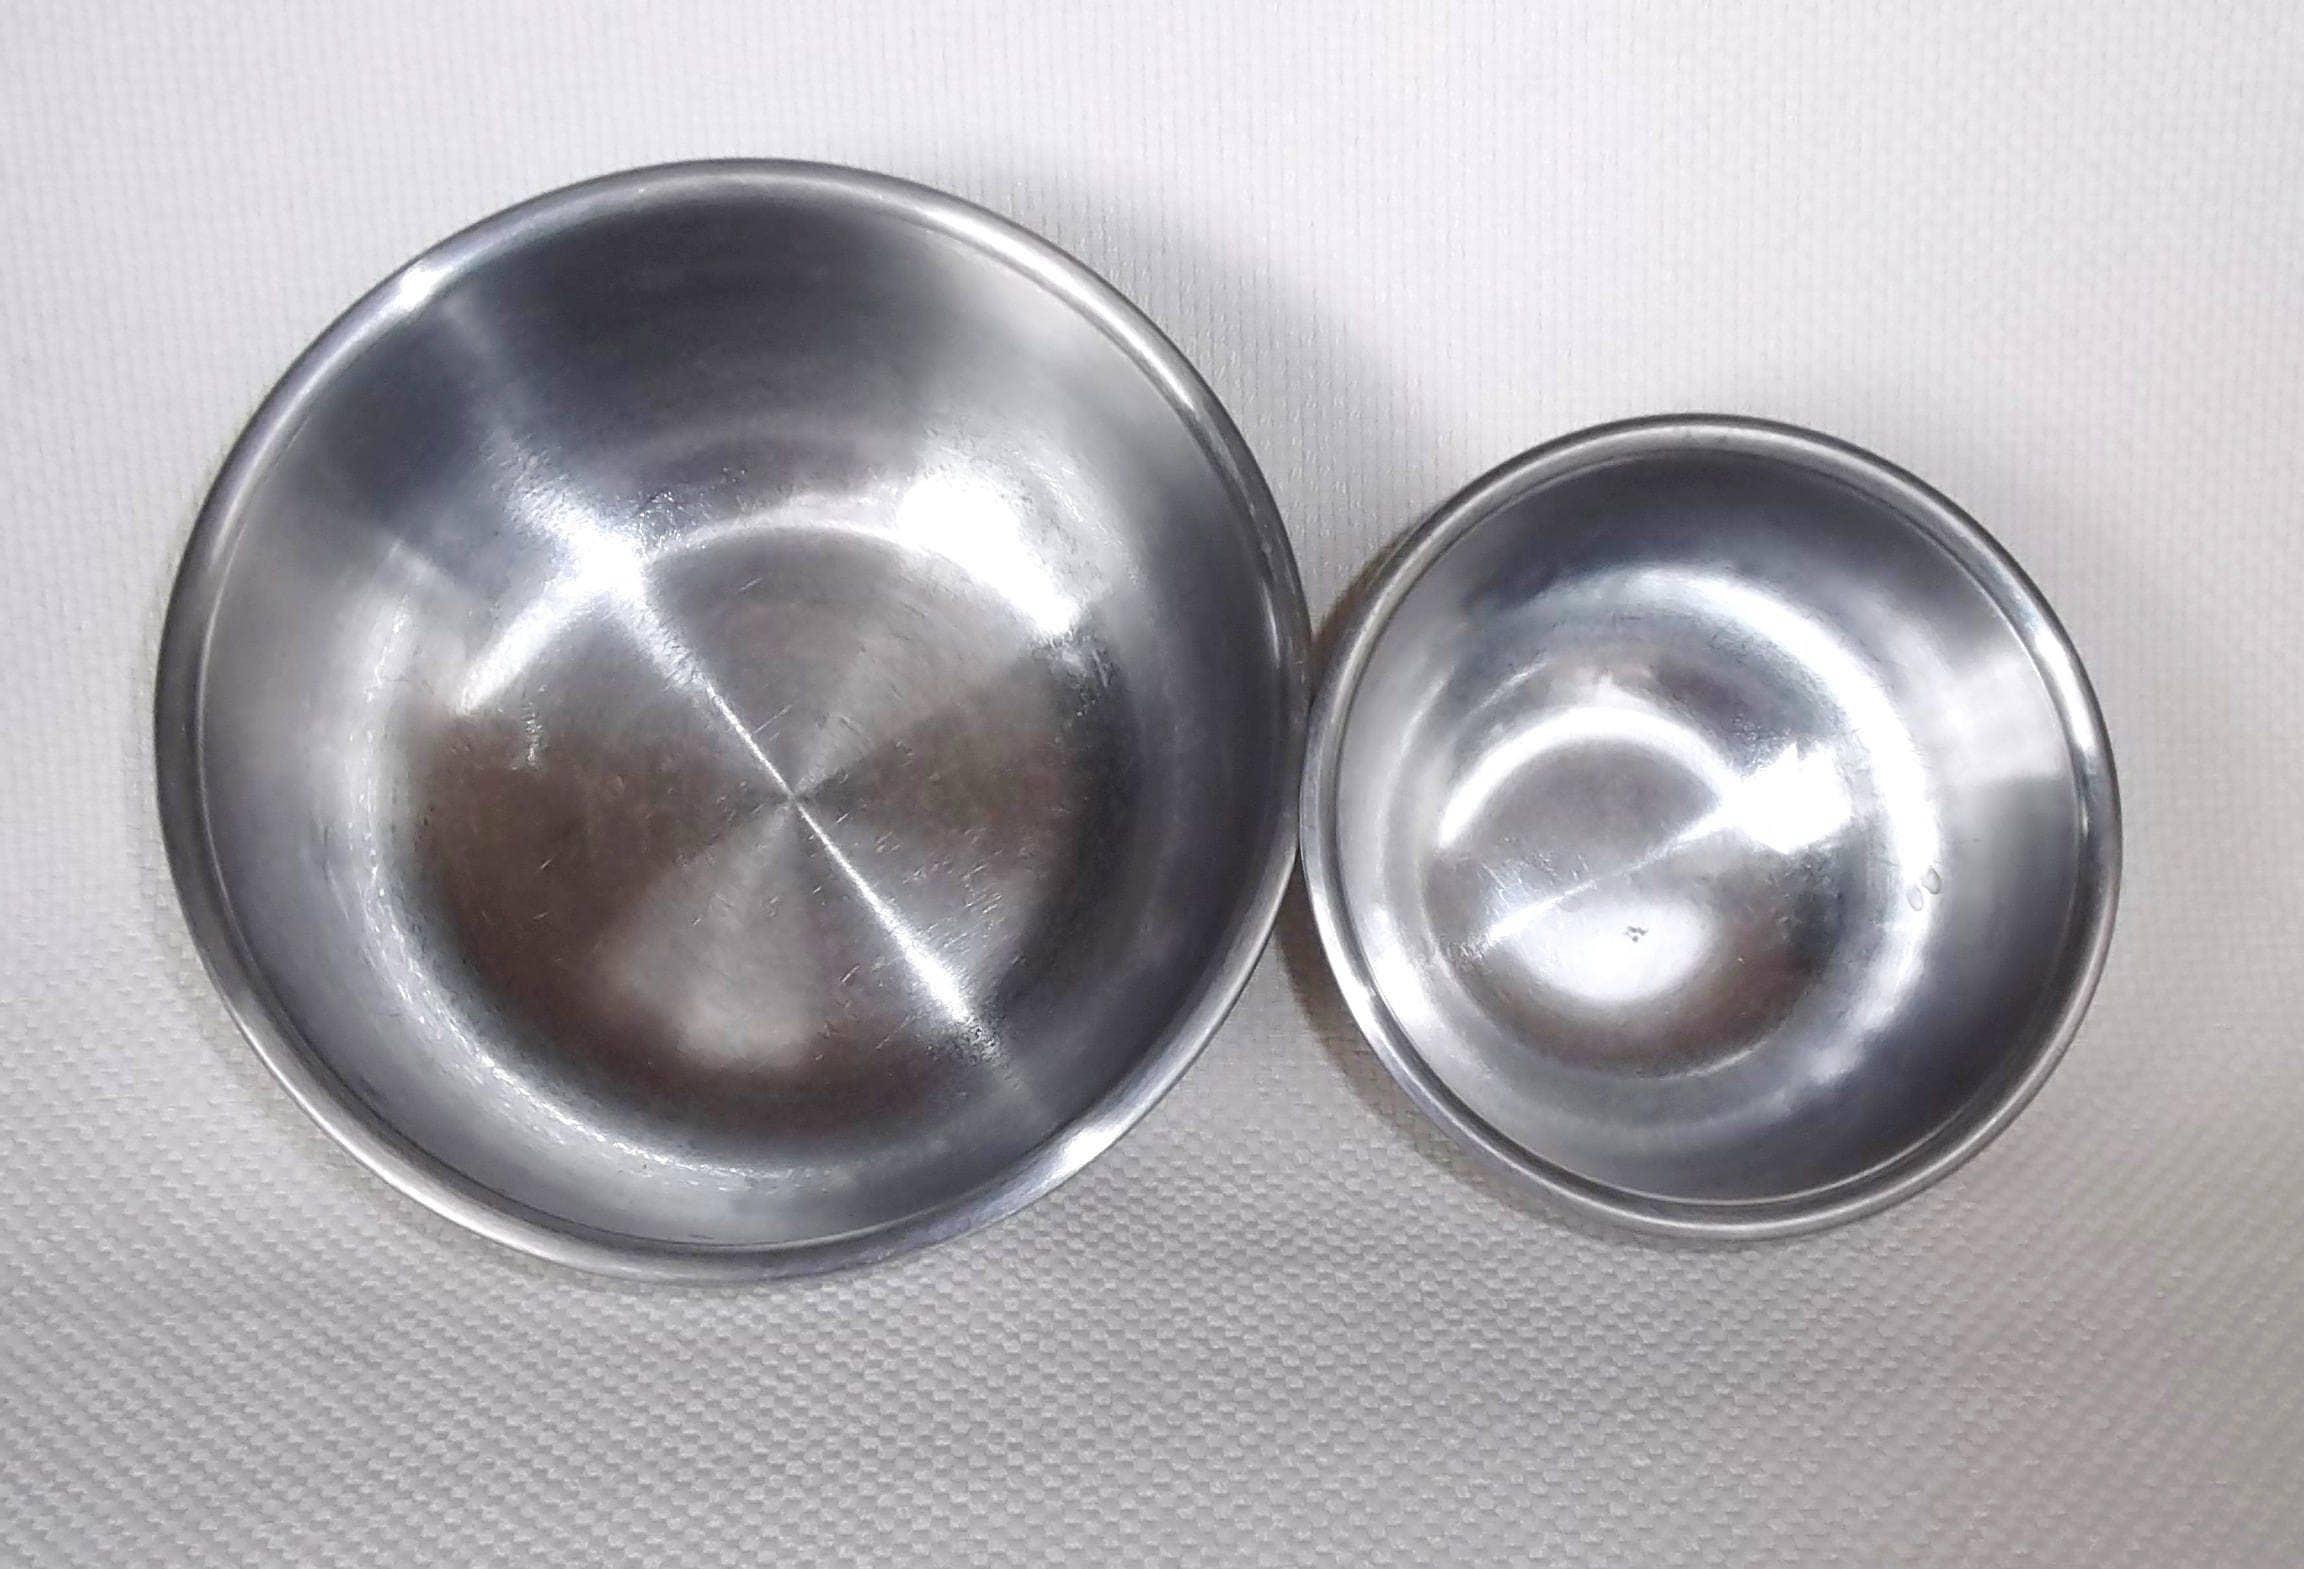 Vintage Vollrath 2 Piece Stainless Steel Mixing Bowl Set 1.5 Quart ...